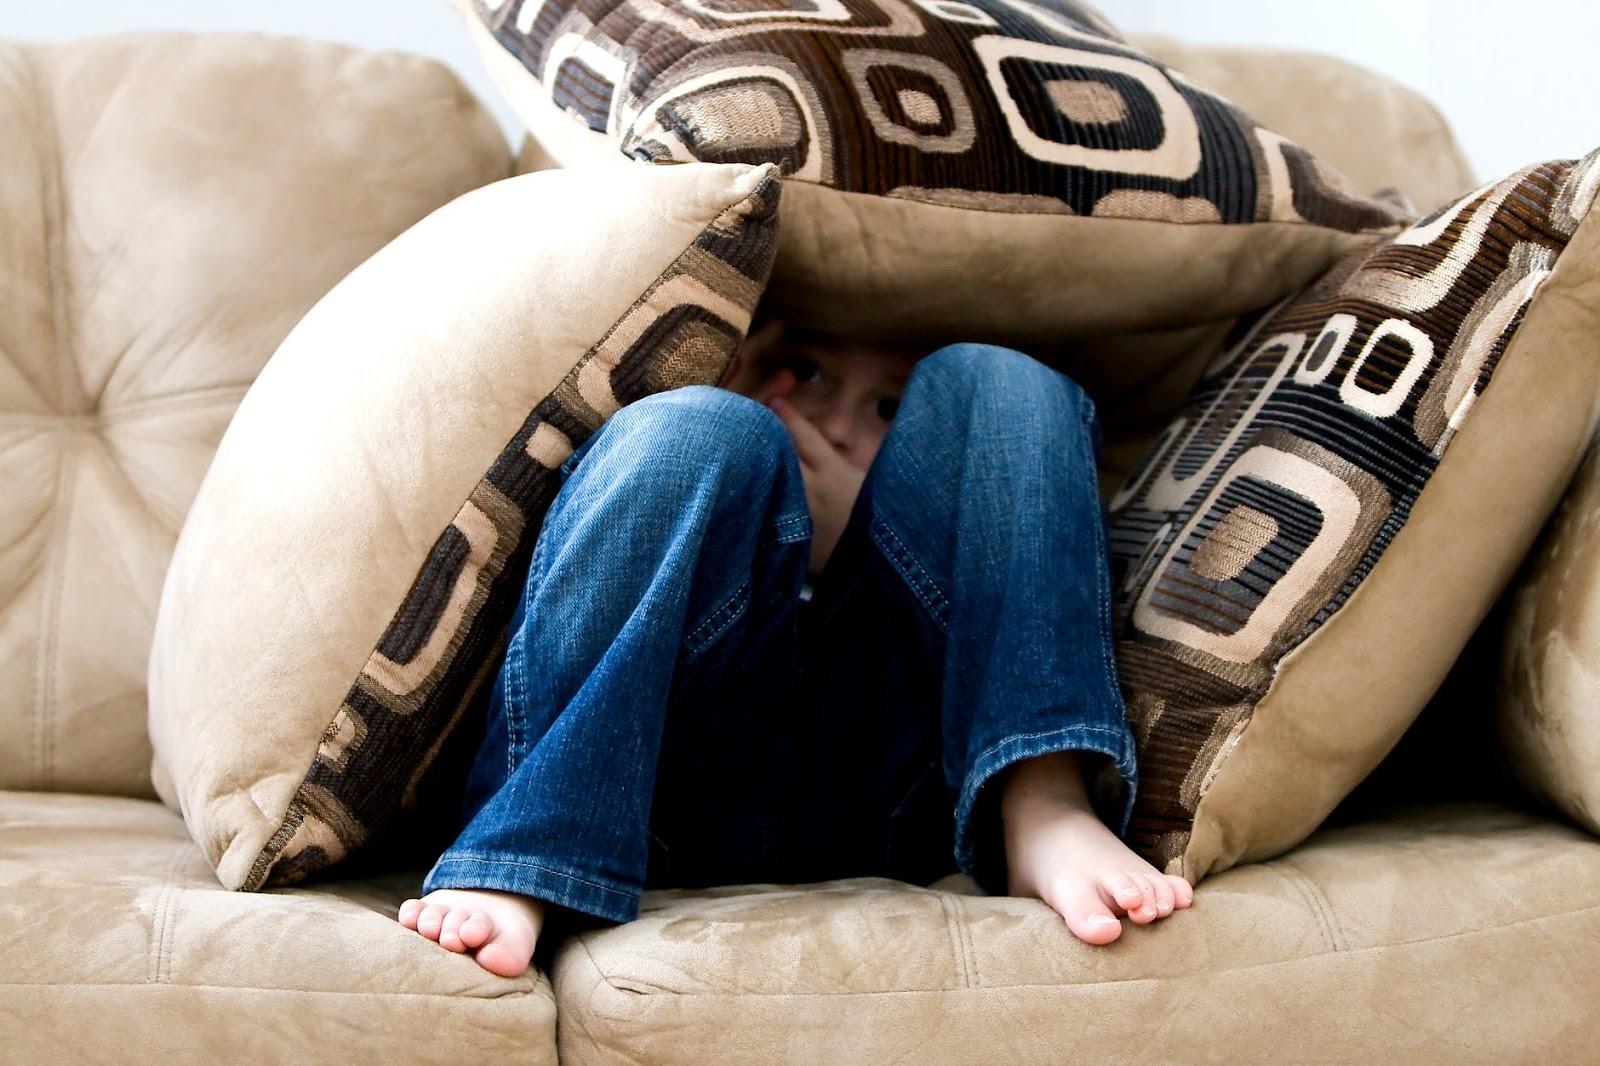 overcoming fear in children